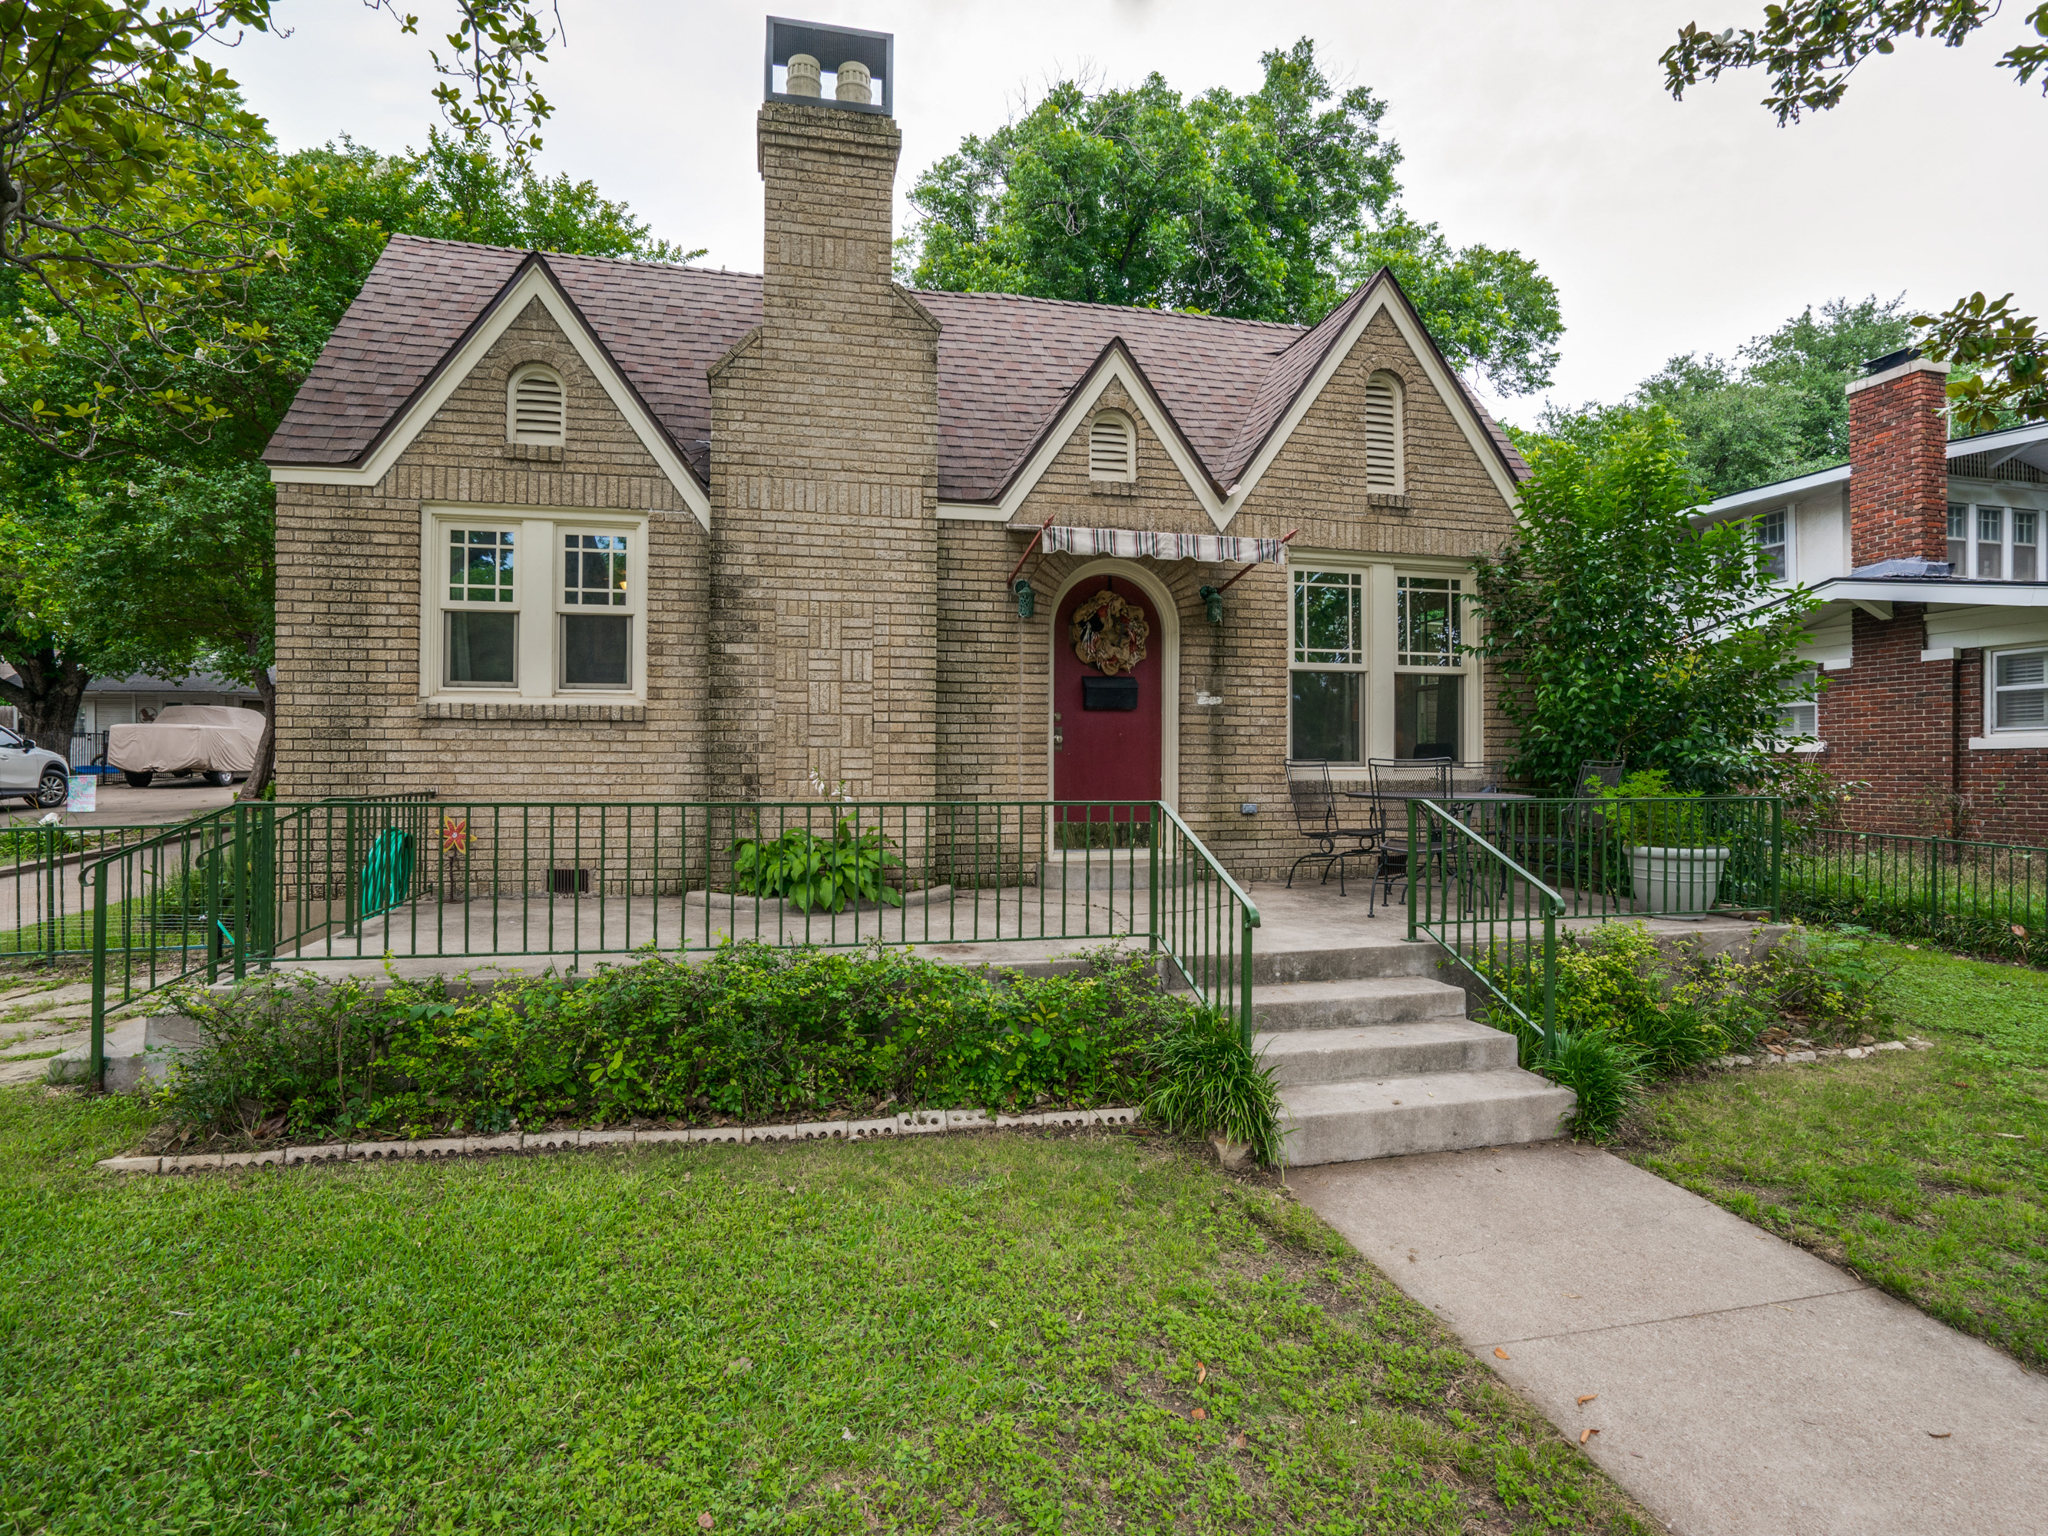 Tek Ailelik Ev için Satış at Quaint Cottage off of Camp Bowie Near Culture District 1222 Virginia Place Fort Worth, Teksas, 76107 Amerika Birleşik Devletleri